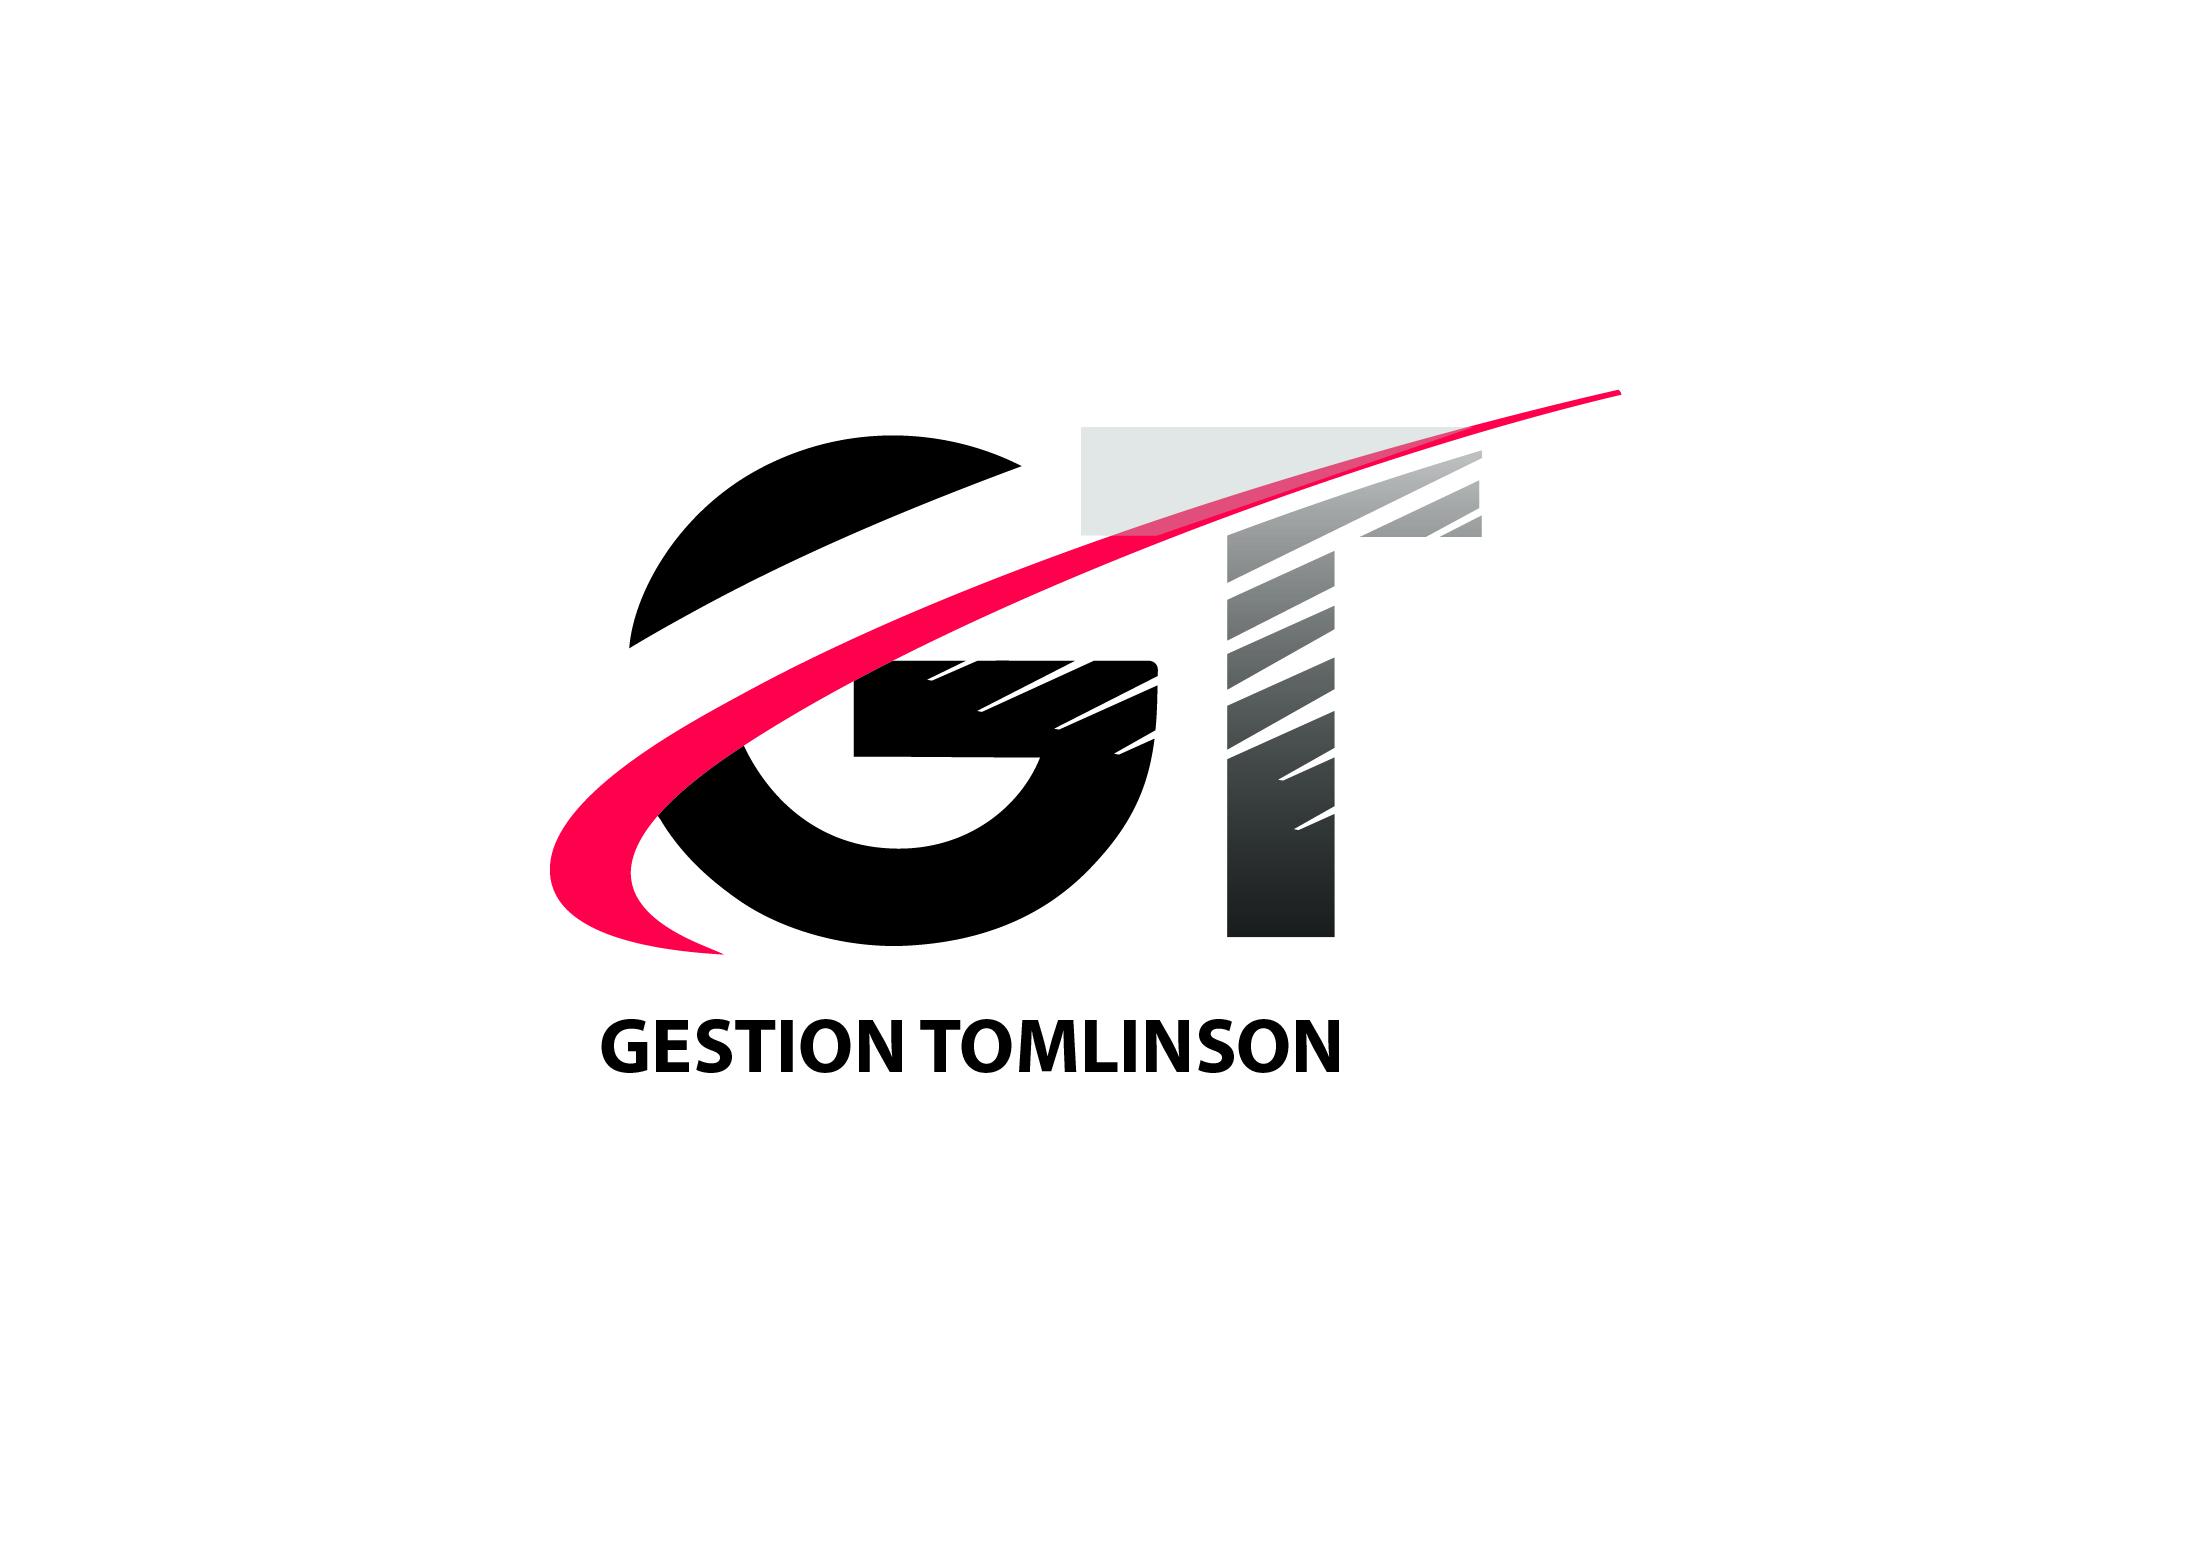 Création logo, graphisme